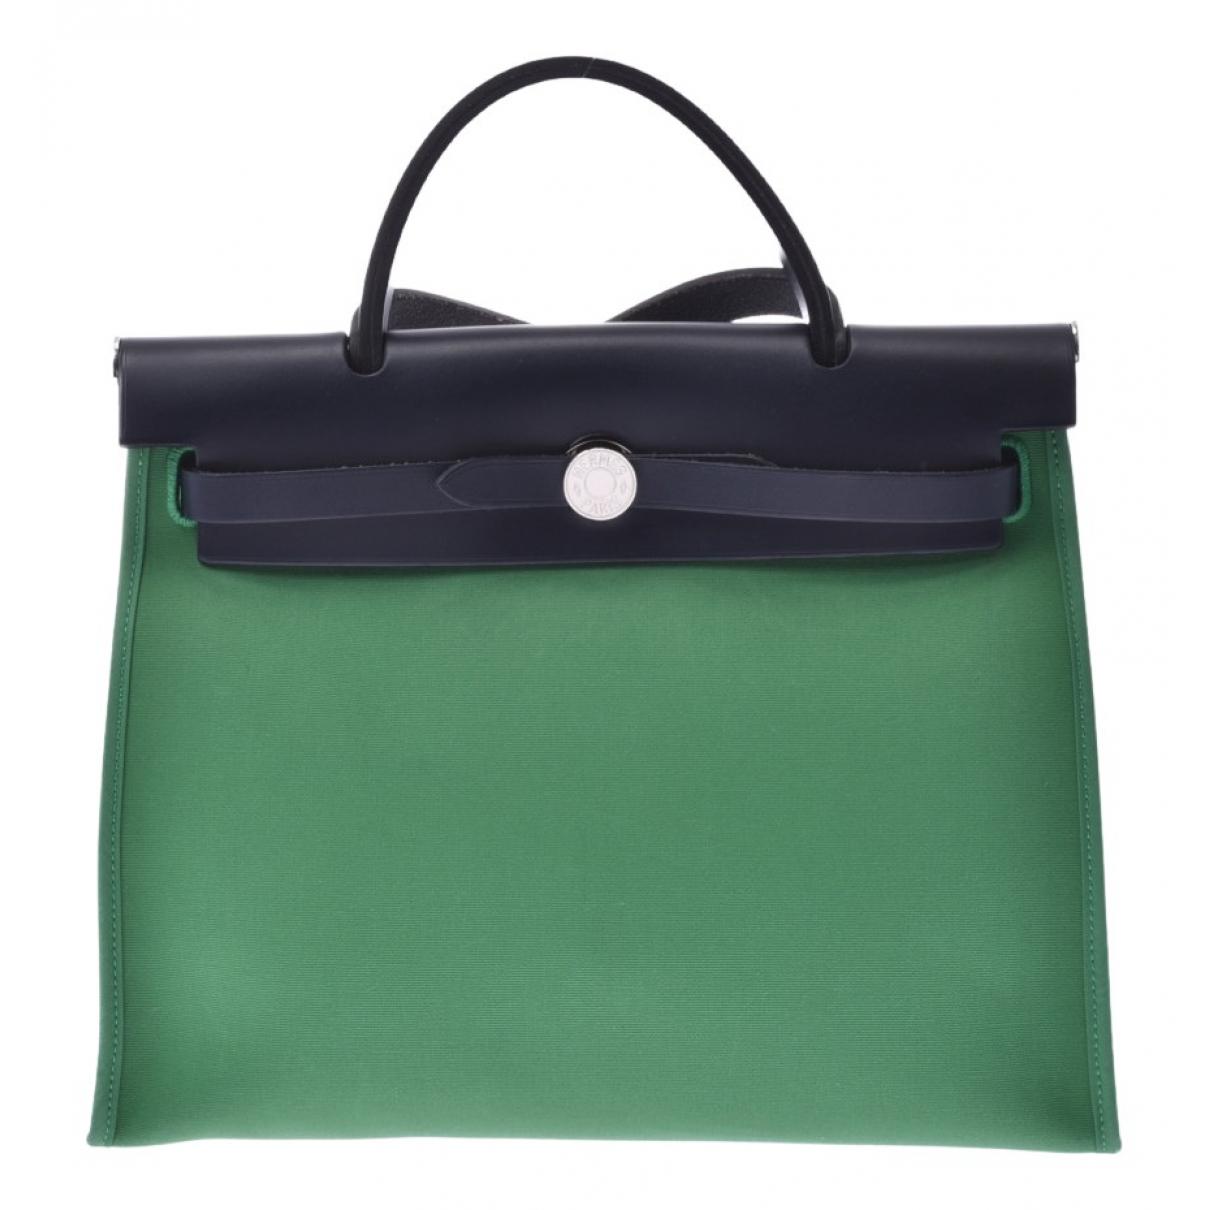 Hermes - Sac a main Herbag pour femme en toile - vert